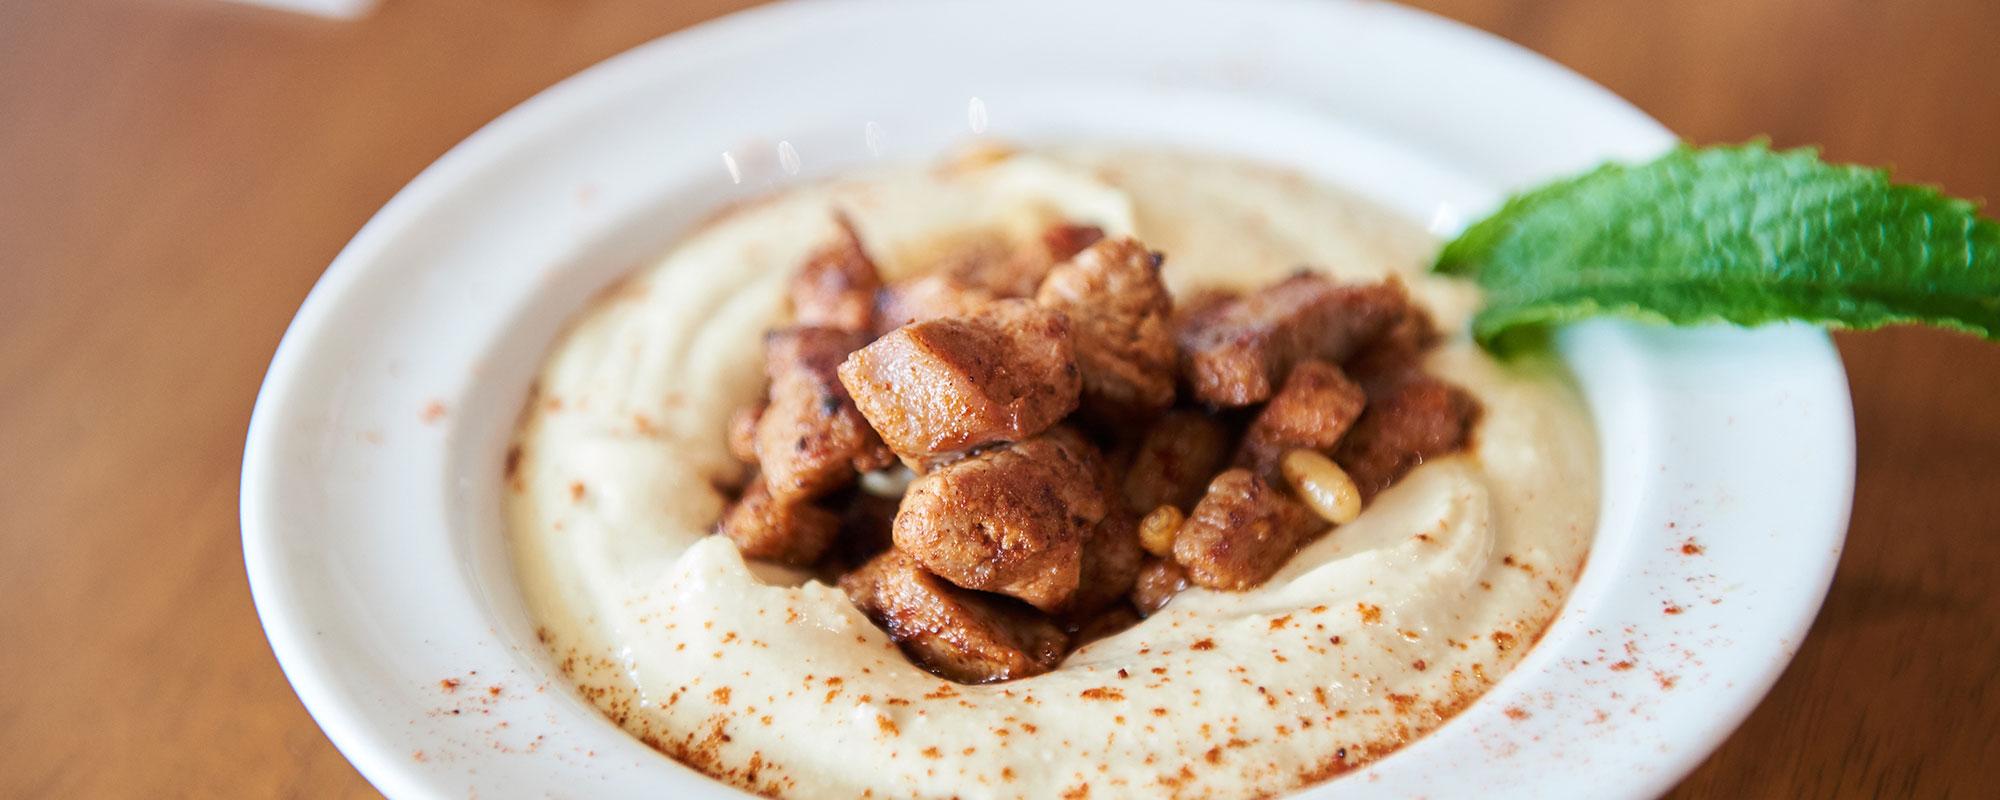 Liman restaurant image of Mediterranean food on plate